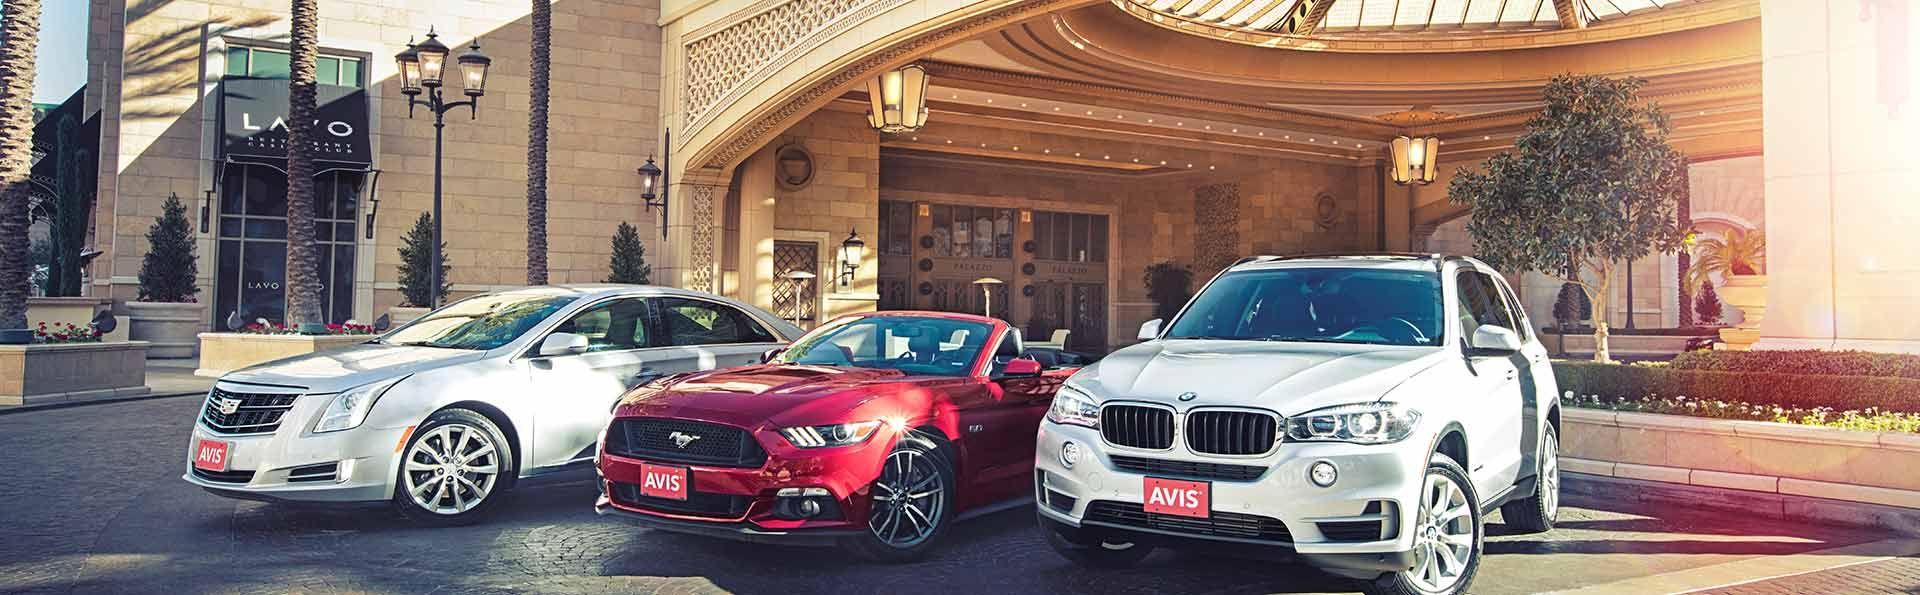 Rent a Car in Las Vegas Las vegas tours, Car rental, Car